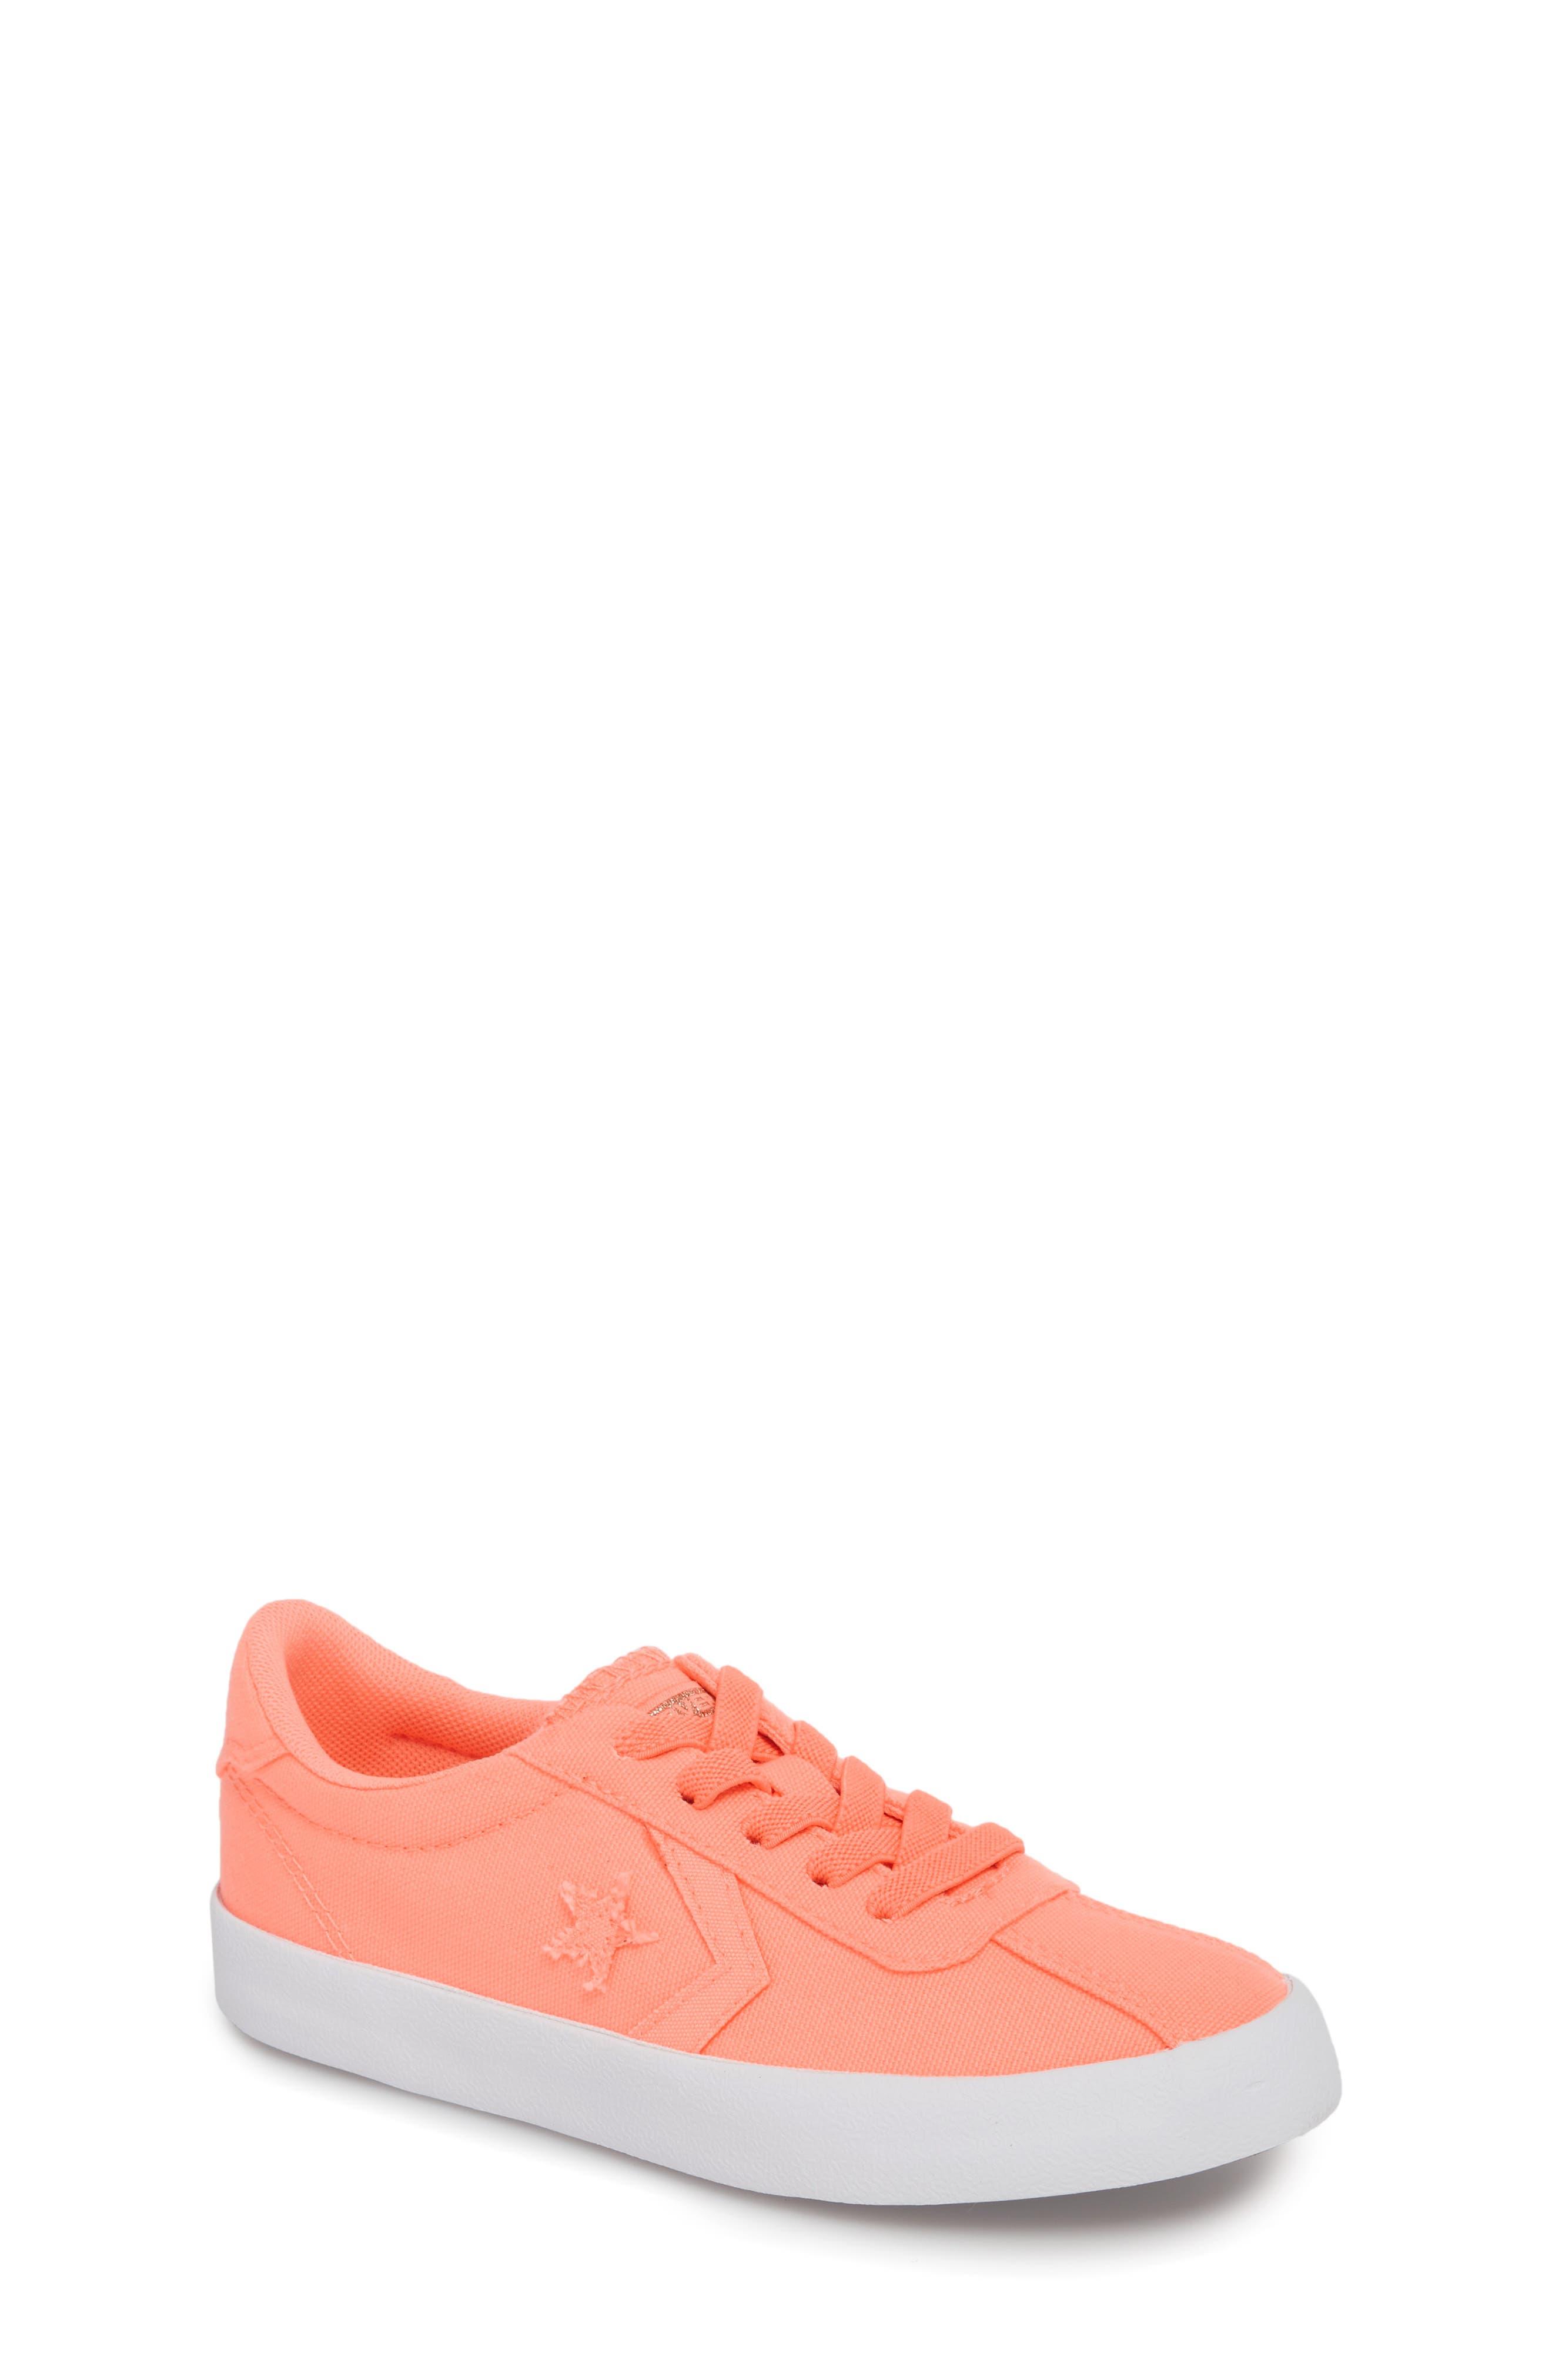 Breakpoint Sneaker,                         Main,                         color, Crimson